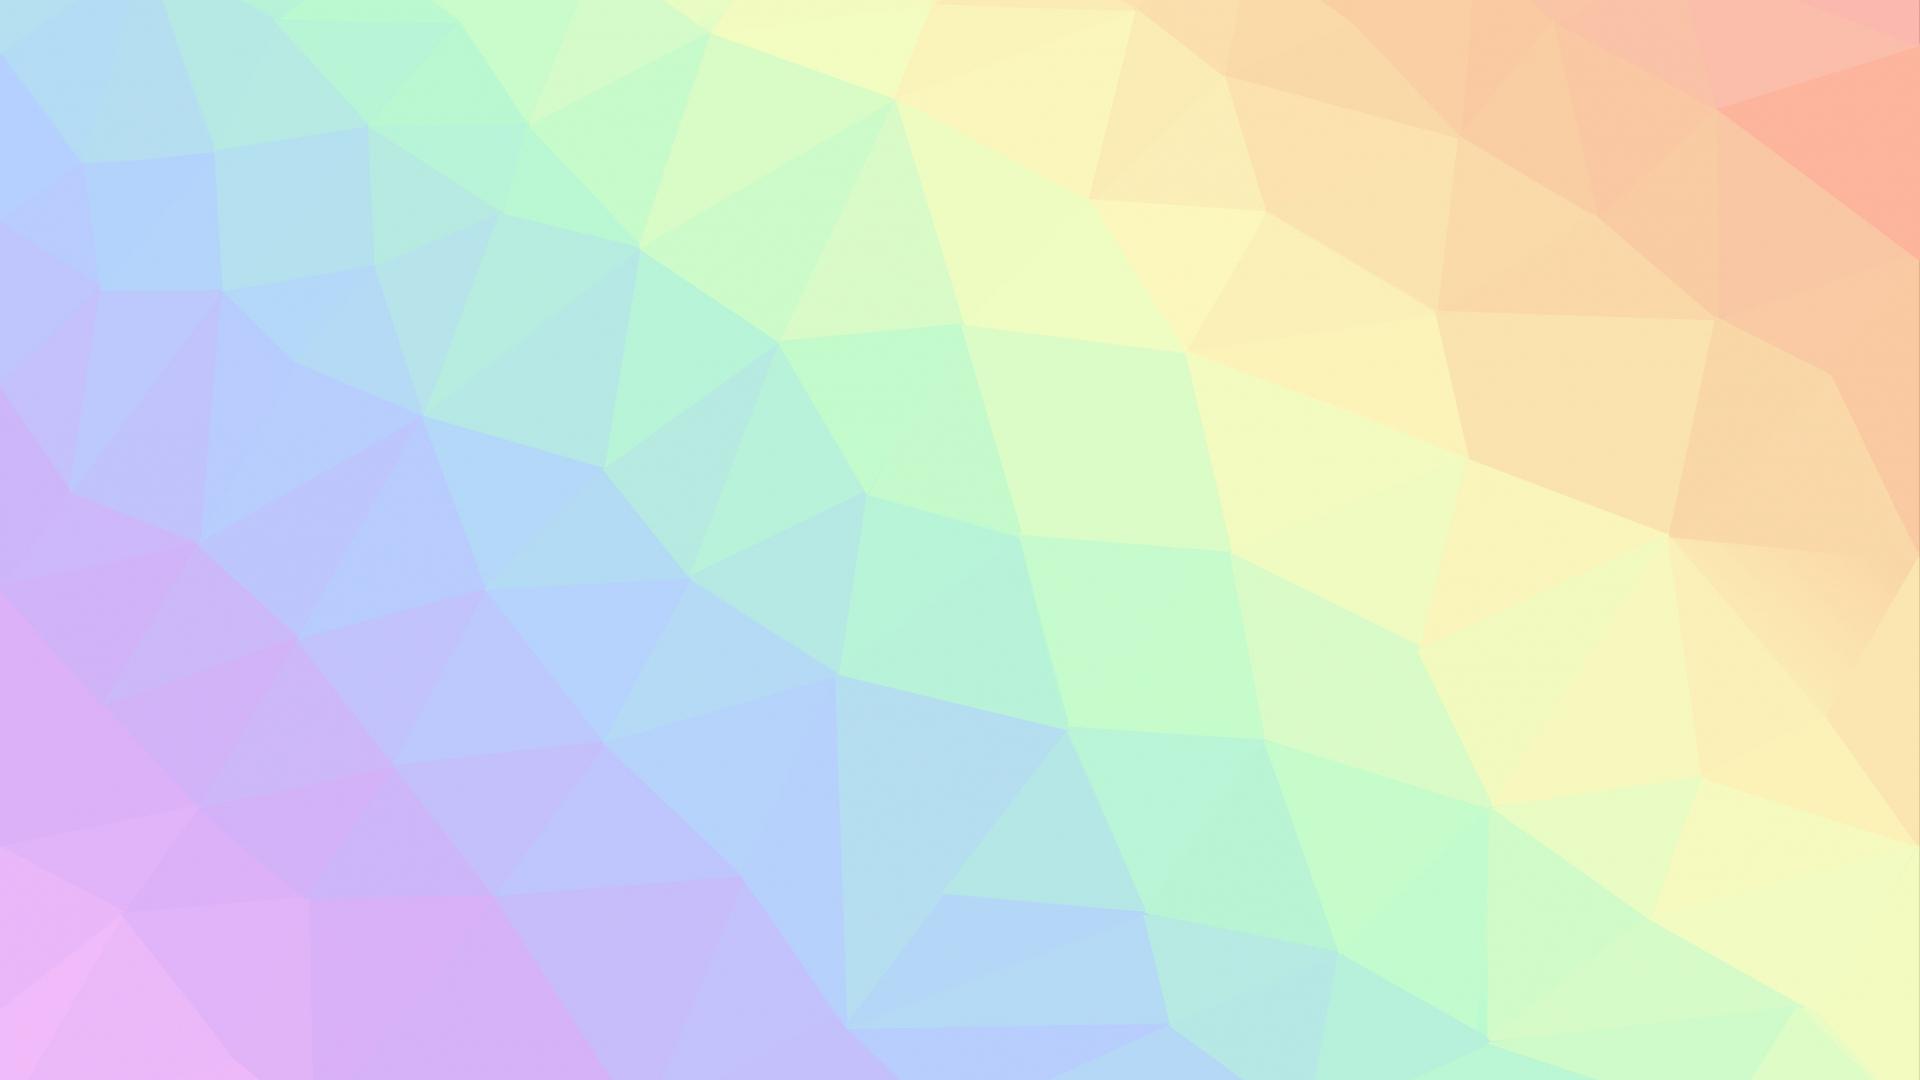 Download 1920x1080 Wallpaper Light Colors Geometric